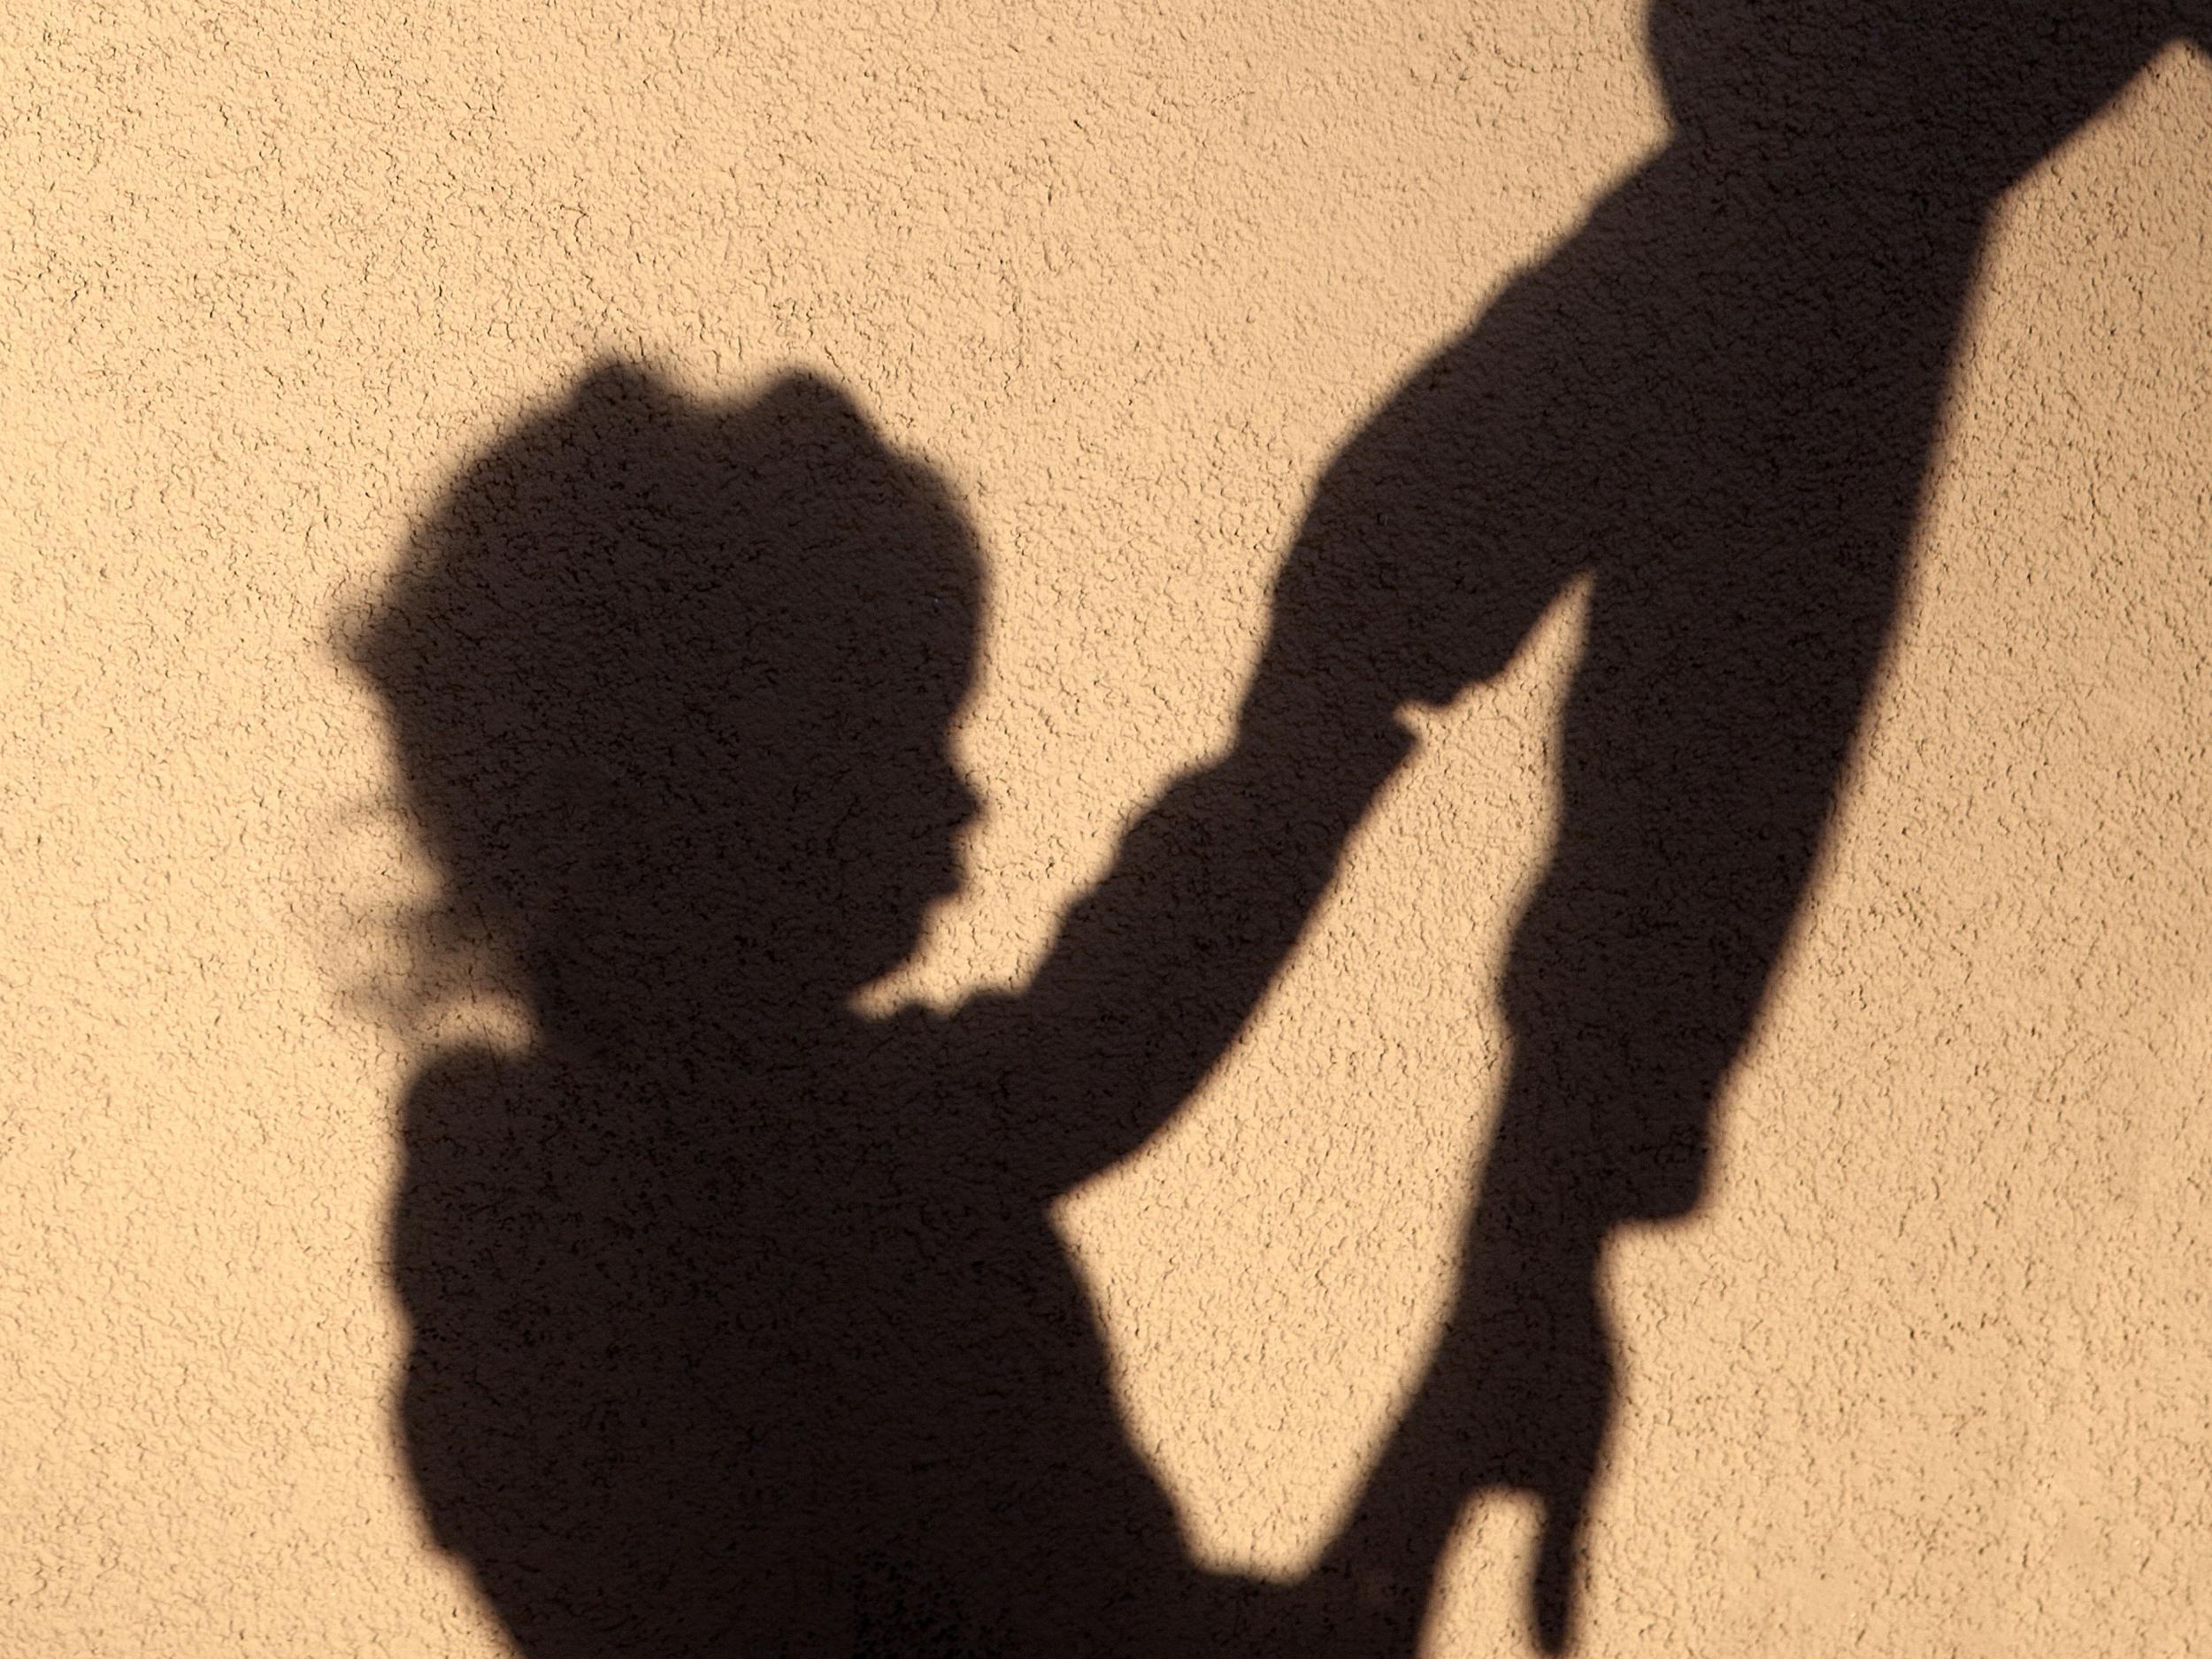 little girl rape pregnant USA Today